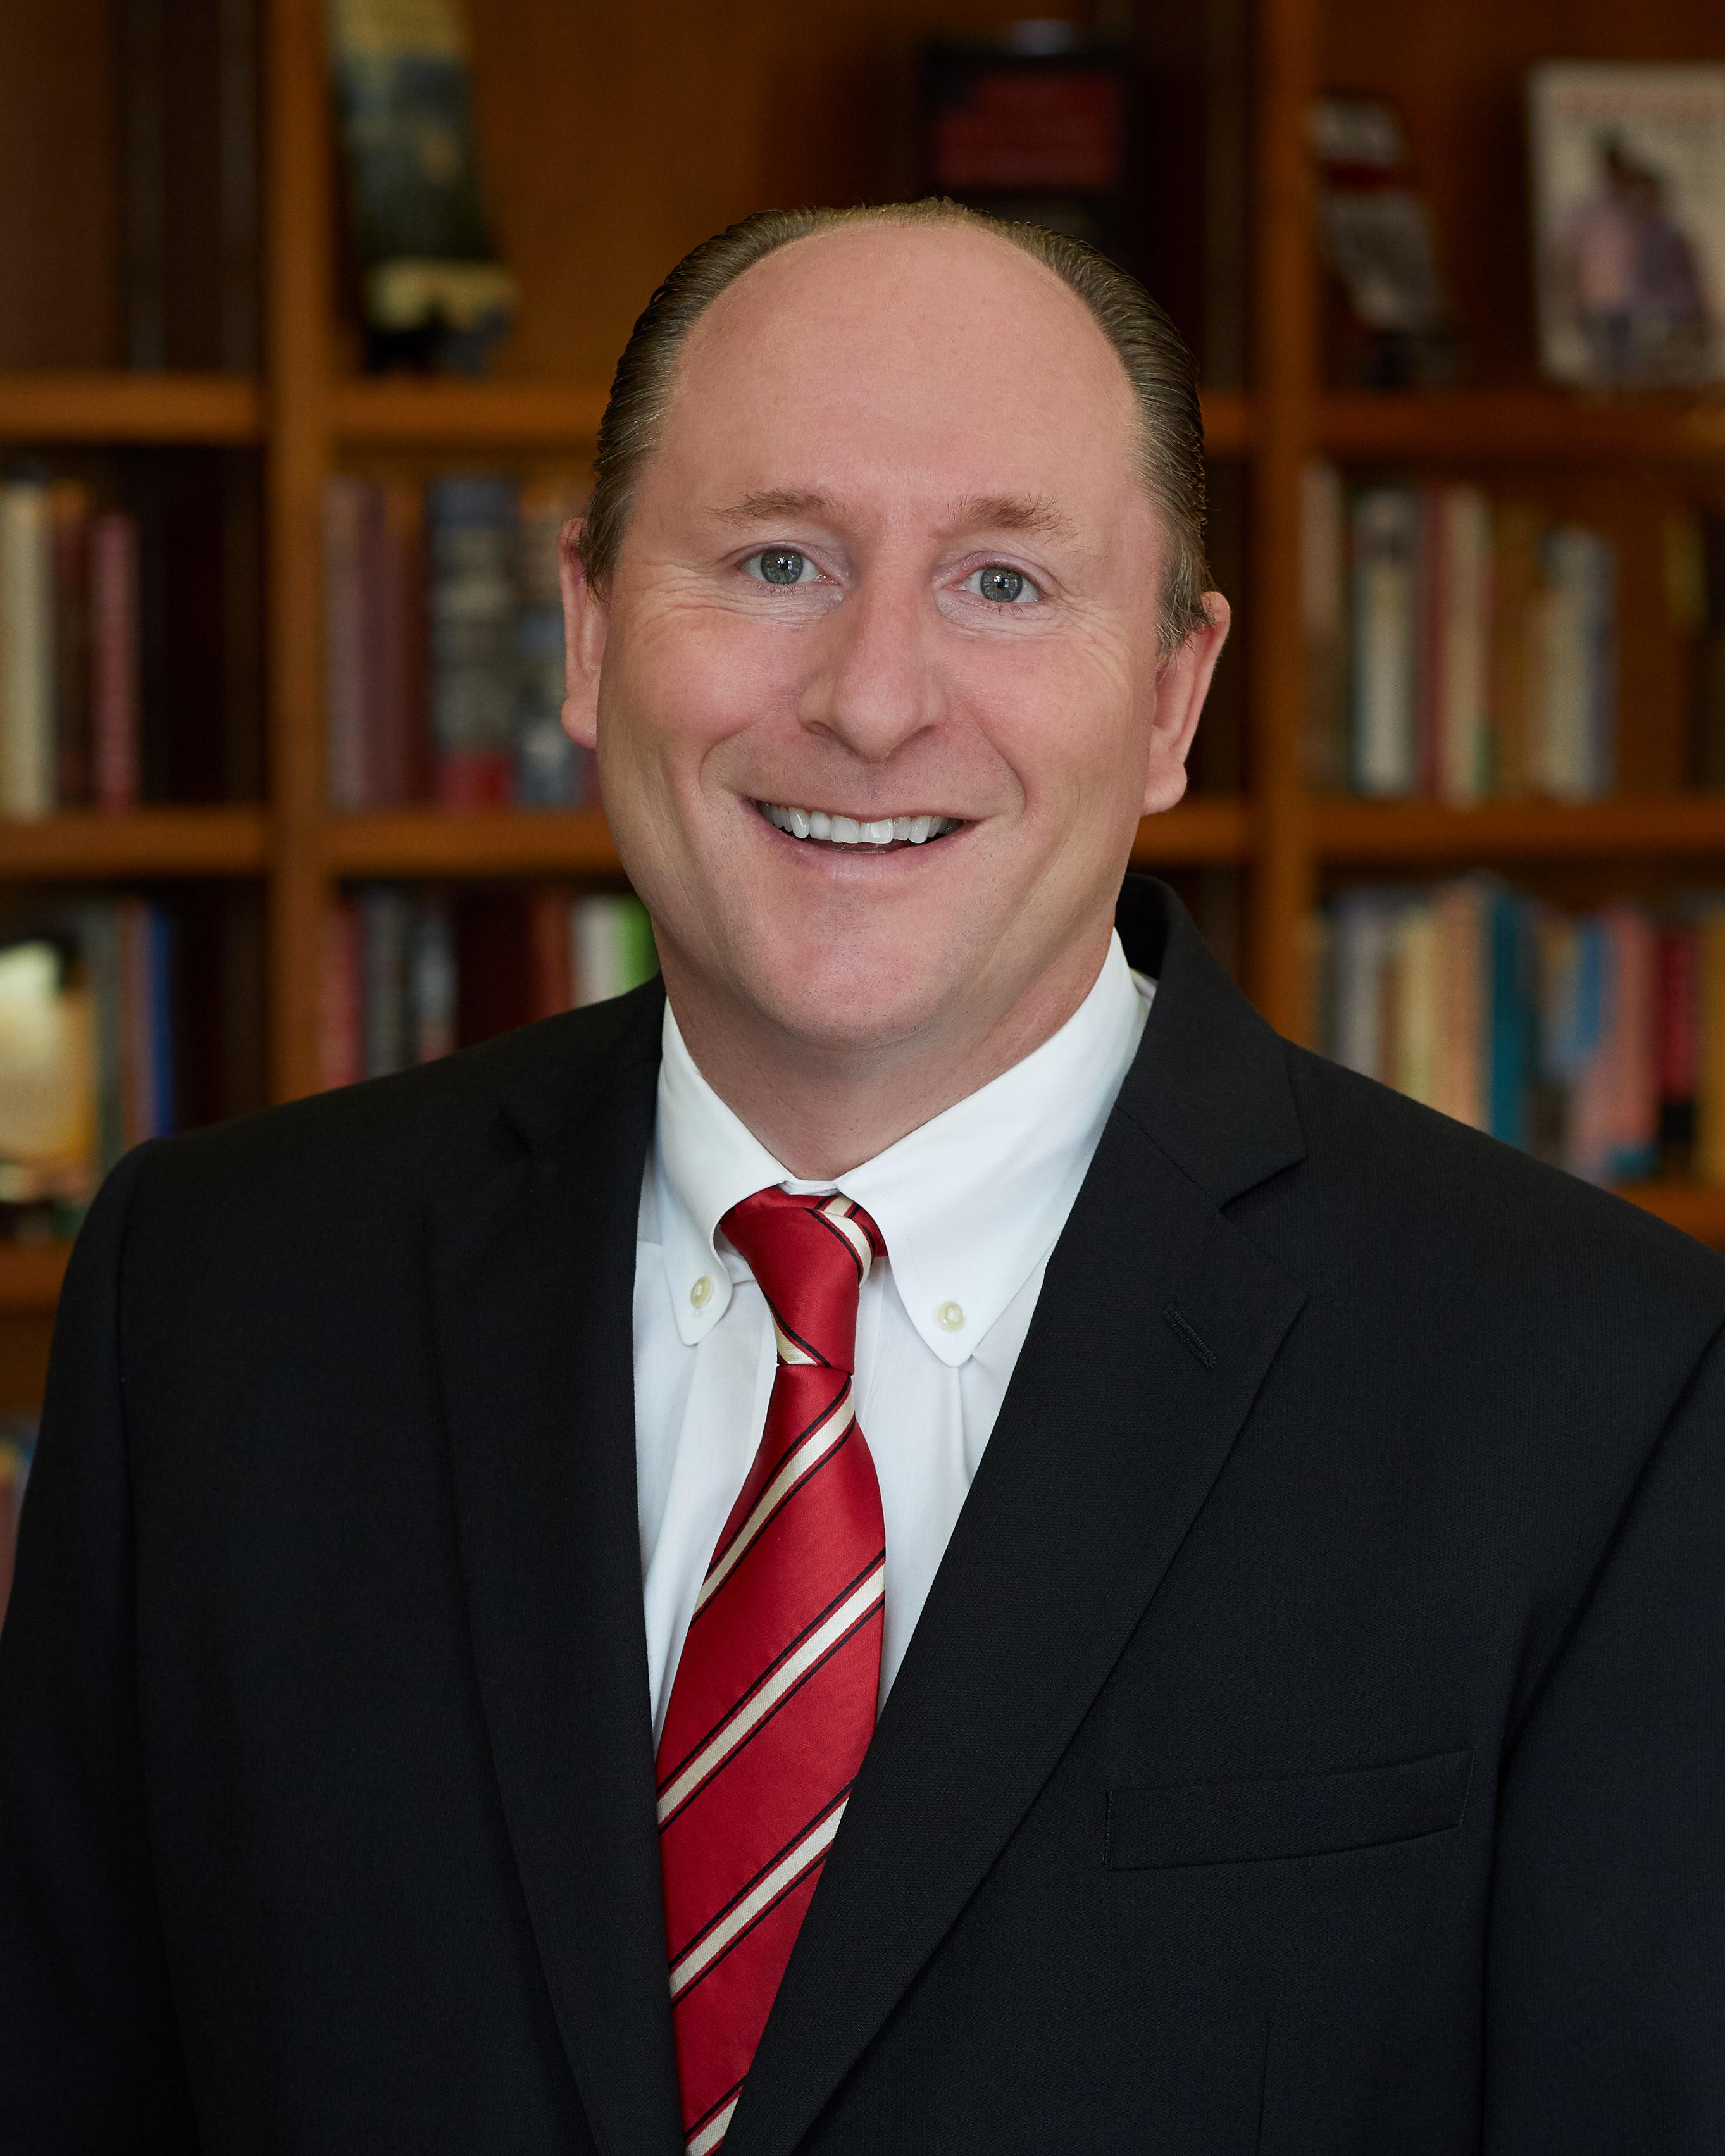 David M. Wrobel